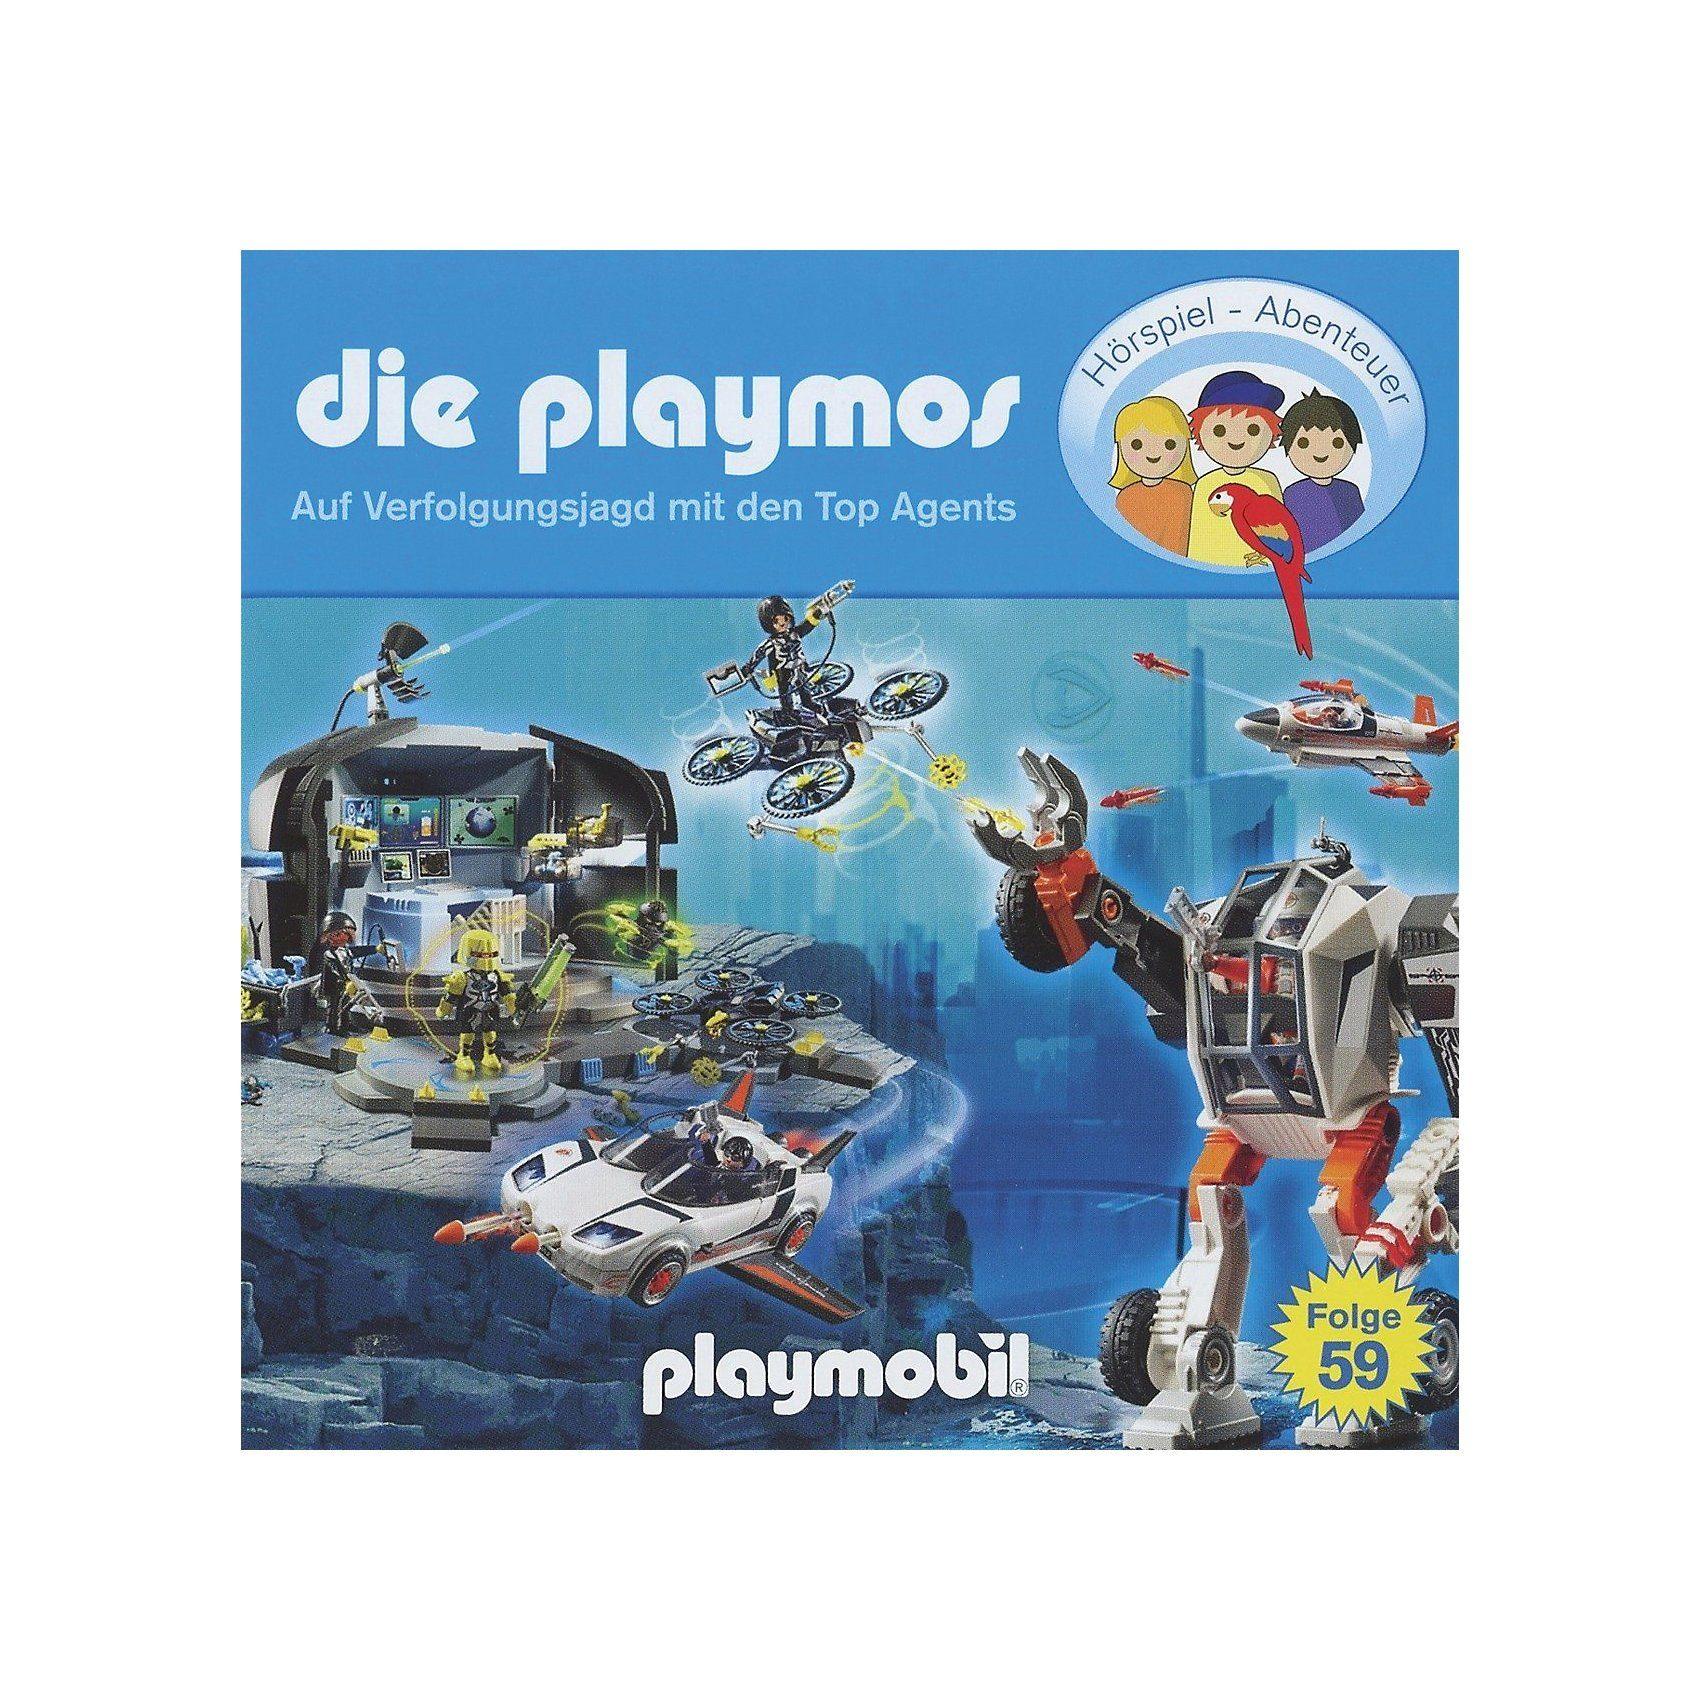 CD Playmos 59 - Auf Verfolgungsjagd mit den Top Agents